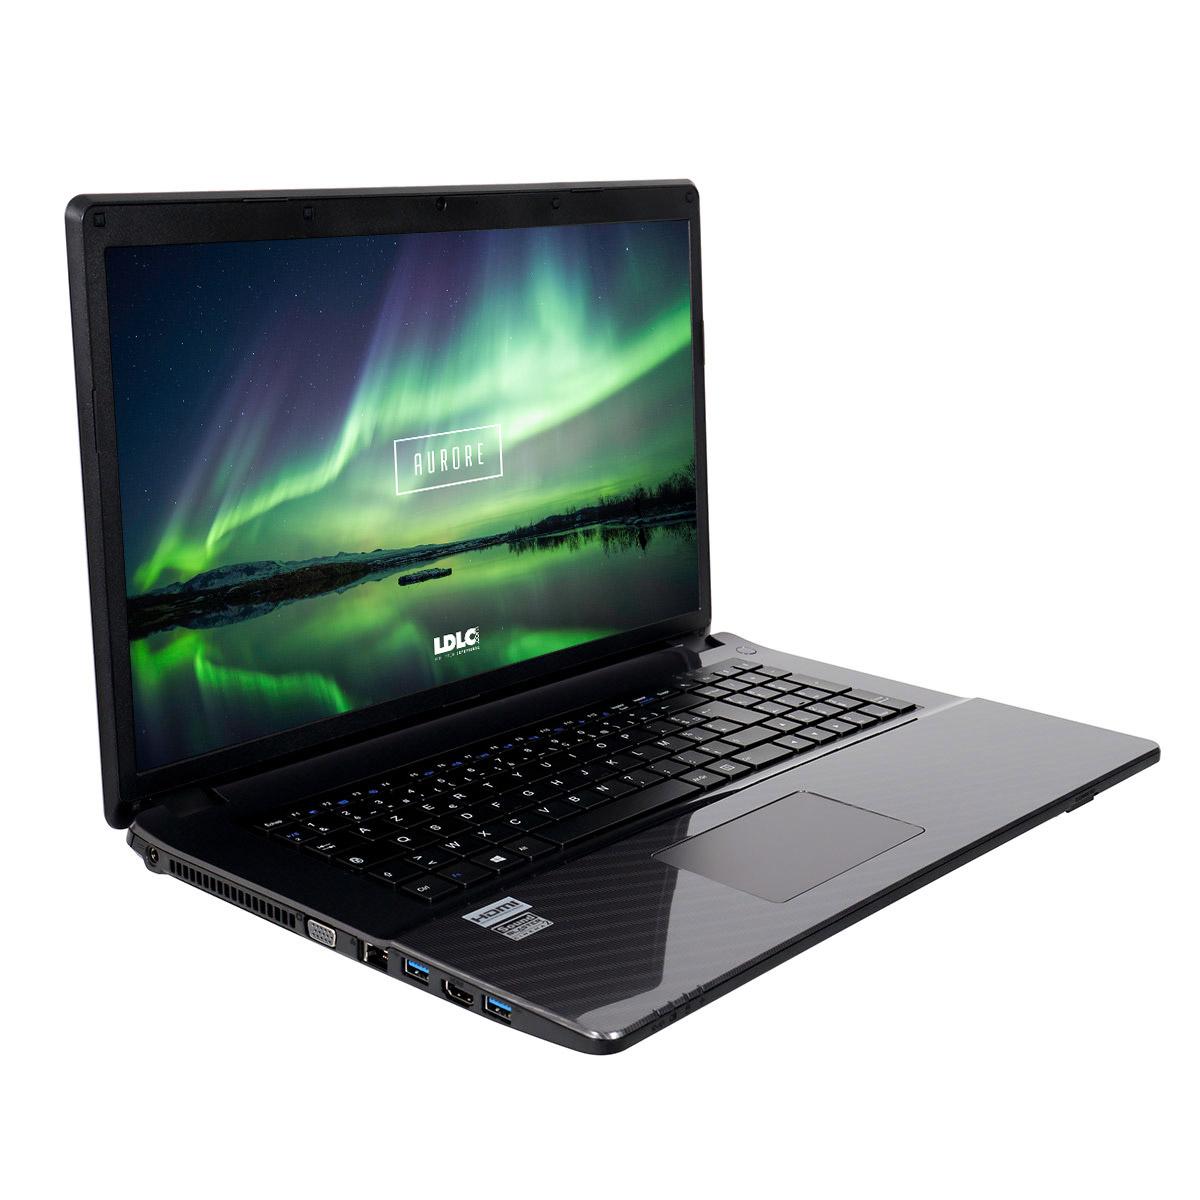 "PC portable LDLC Aurore CI5P-16-S2H20 Intel Core i5-6300HQ 16 Go SSD 240 Go + HDD 2 To 17.3"" LED Full HD Graveur DVD Wi-Fi N/Bluetooth Webcam (sans OS)"